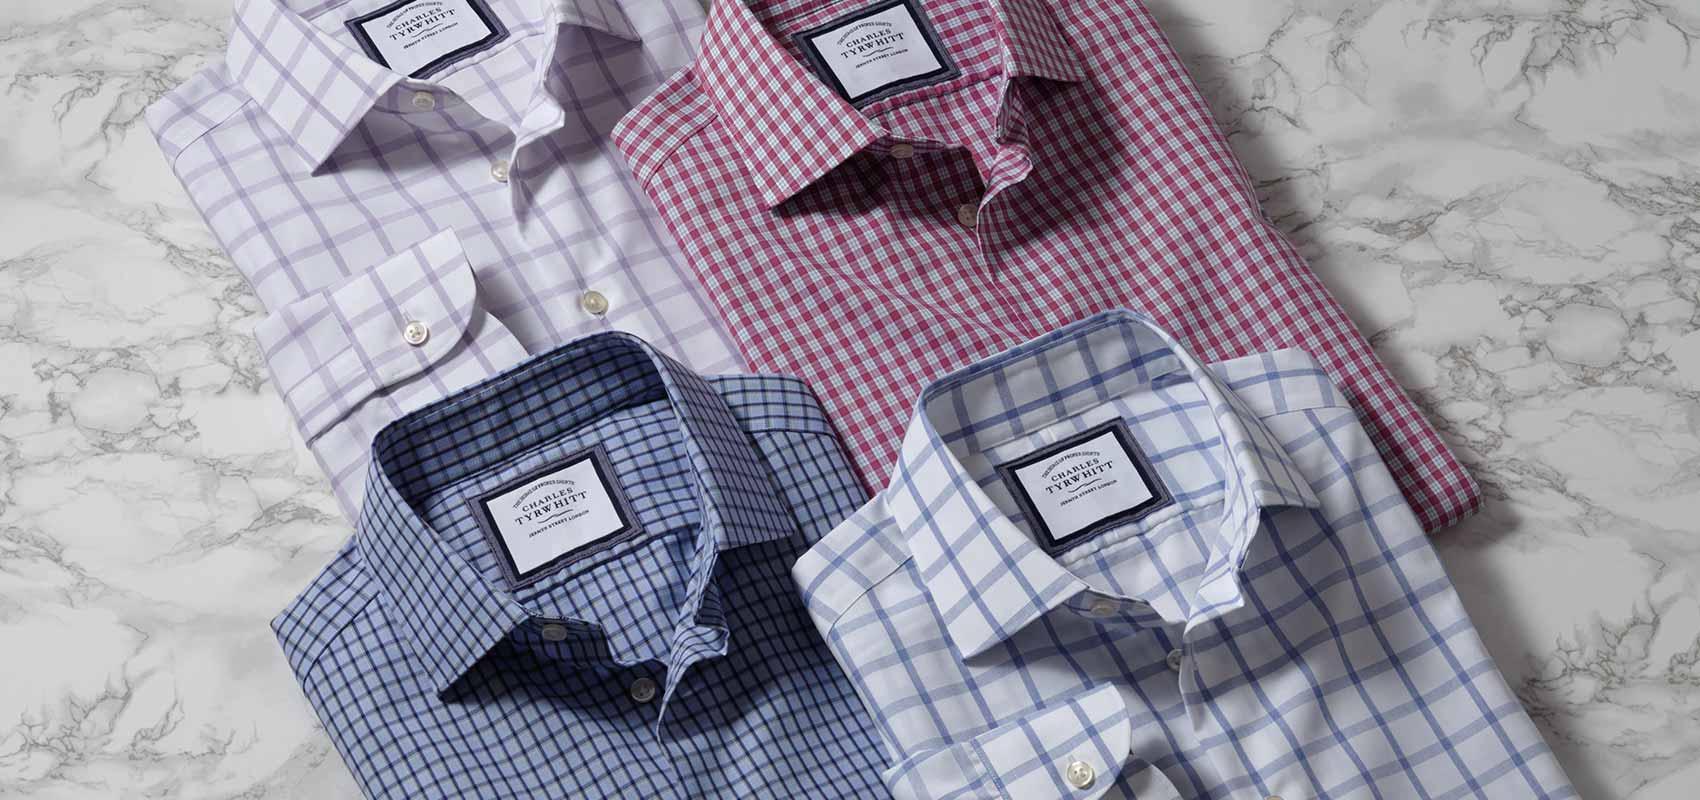 Charles Tyrwhitt business-casual shirts